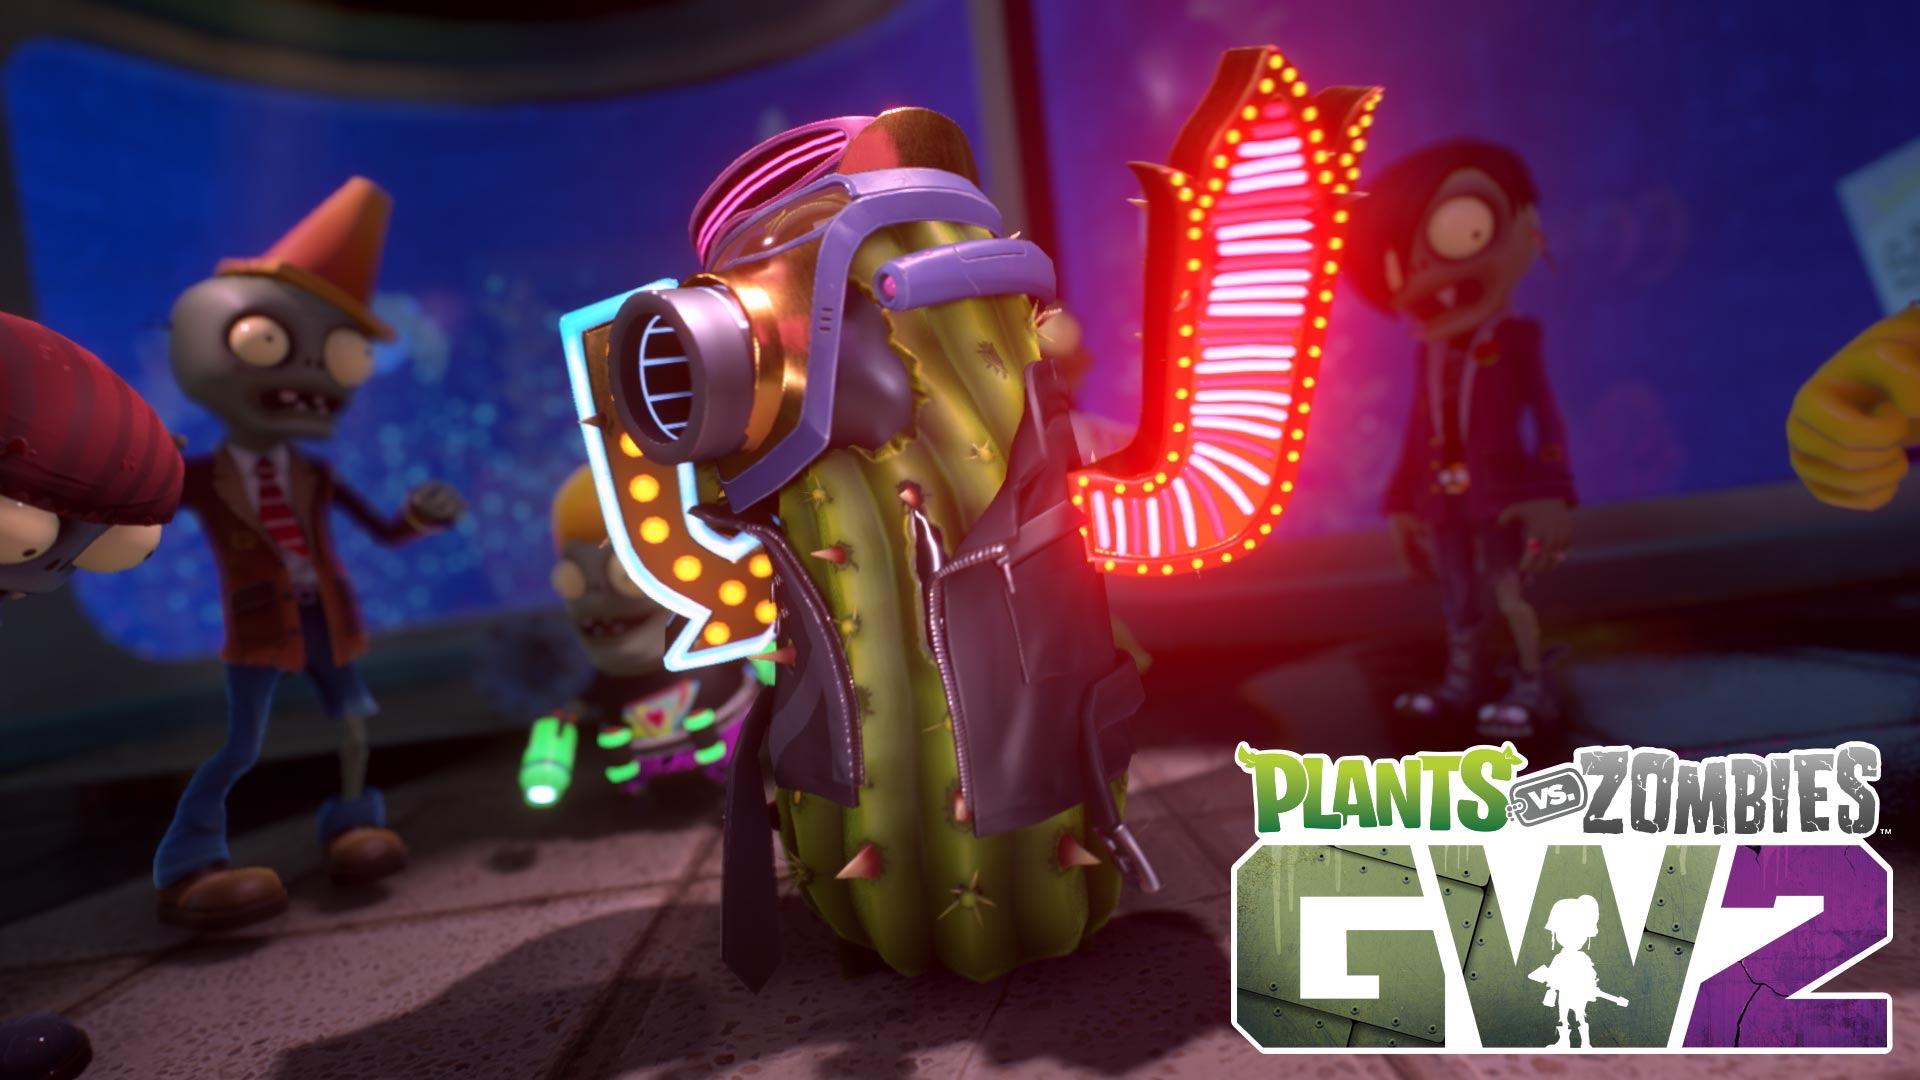 plants vs zombies garden warfare 2 gratis